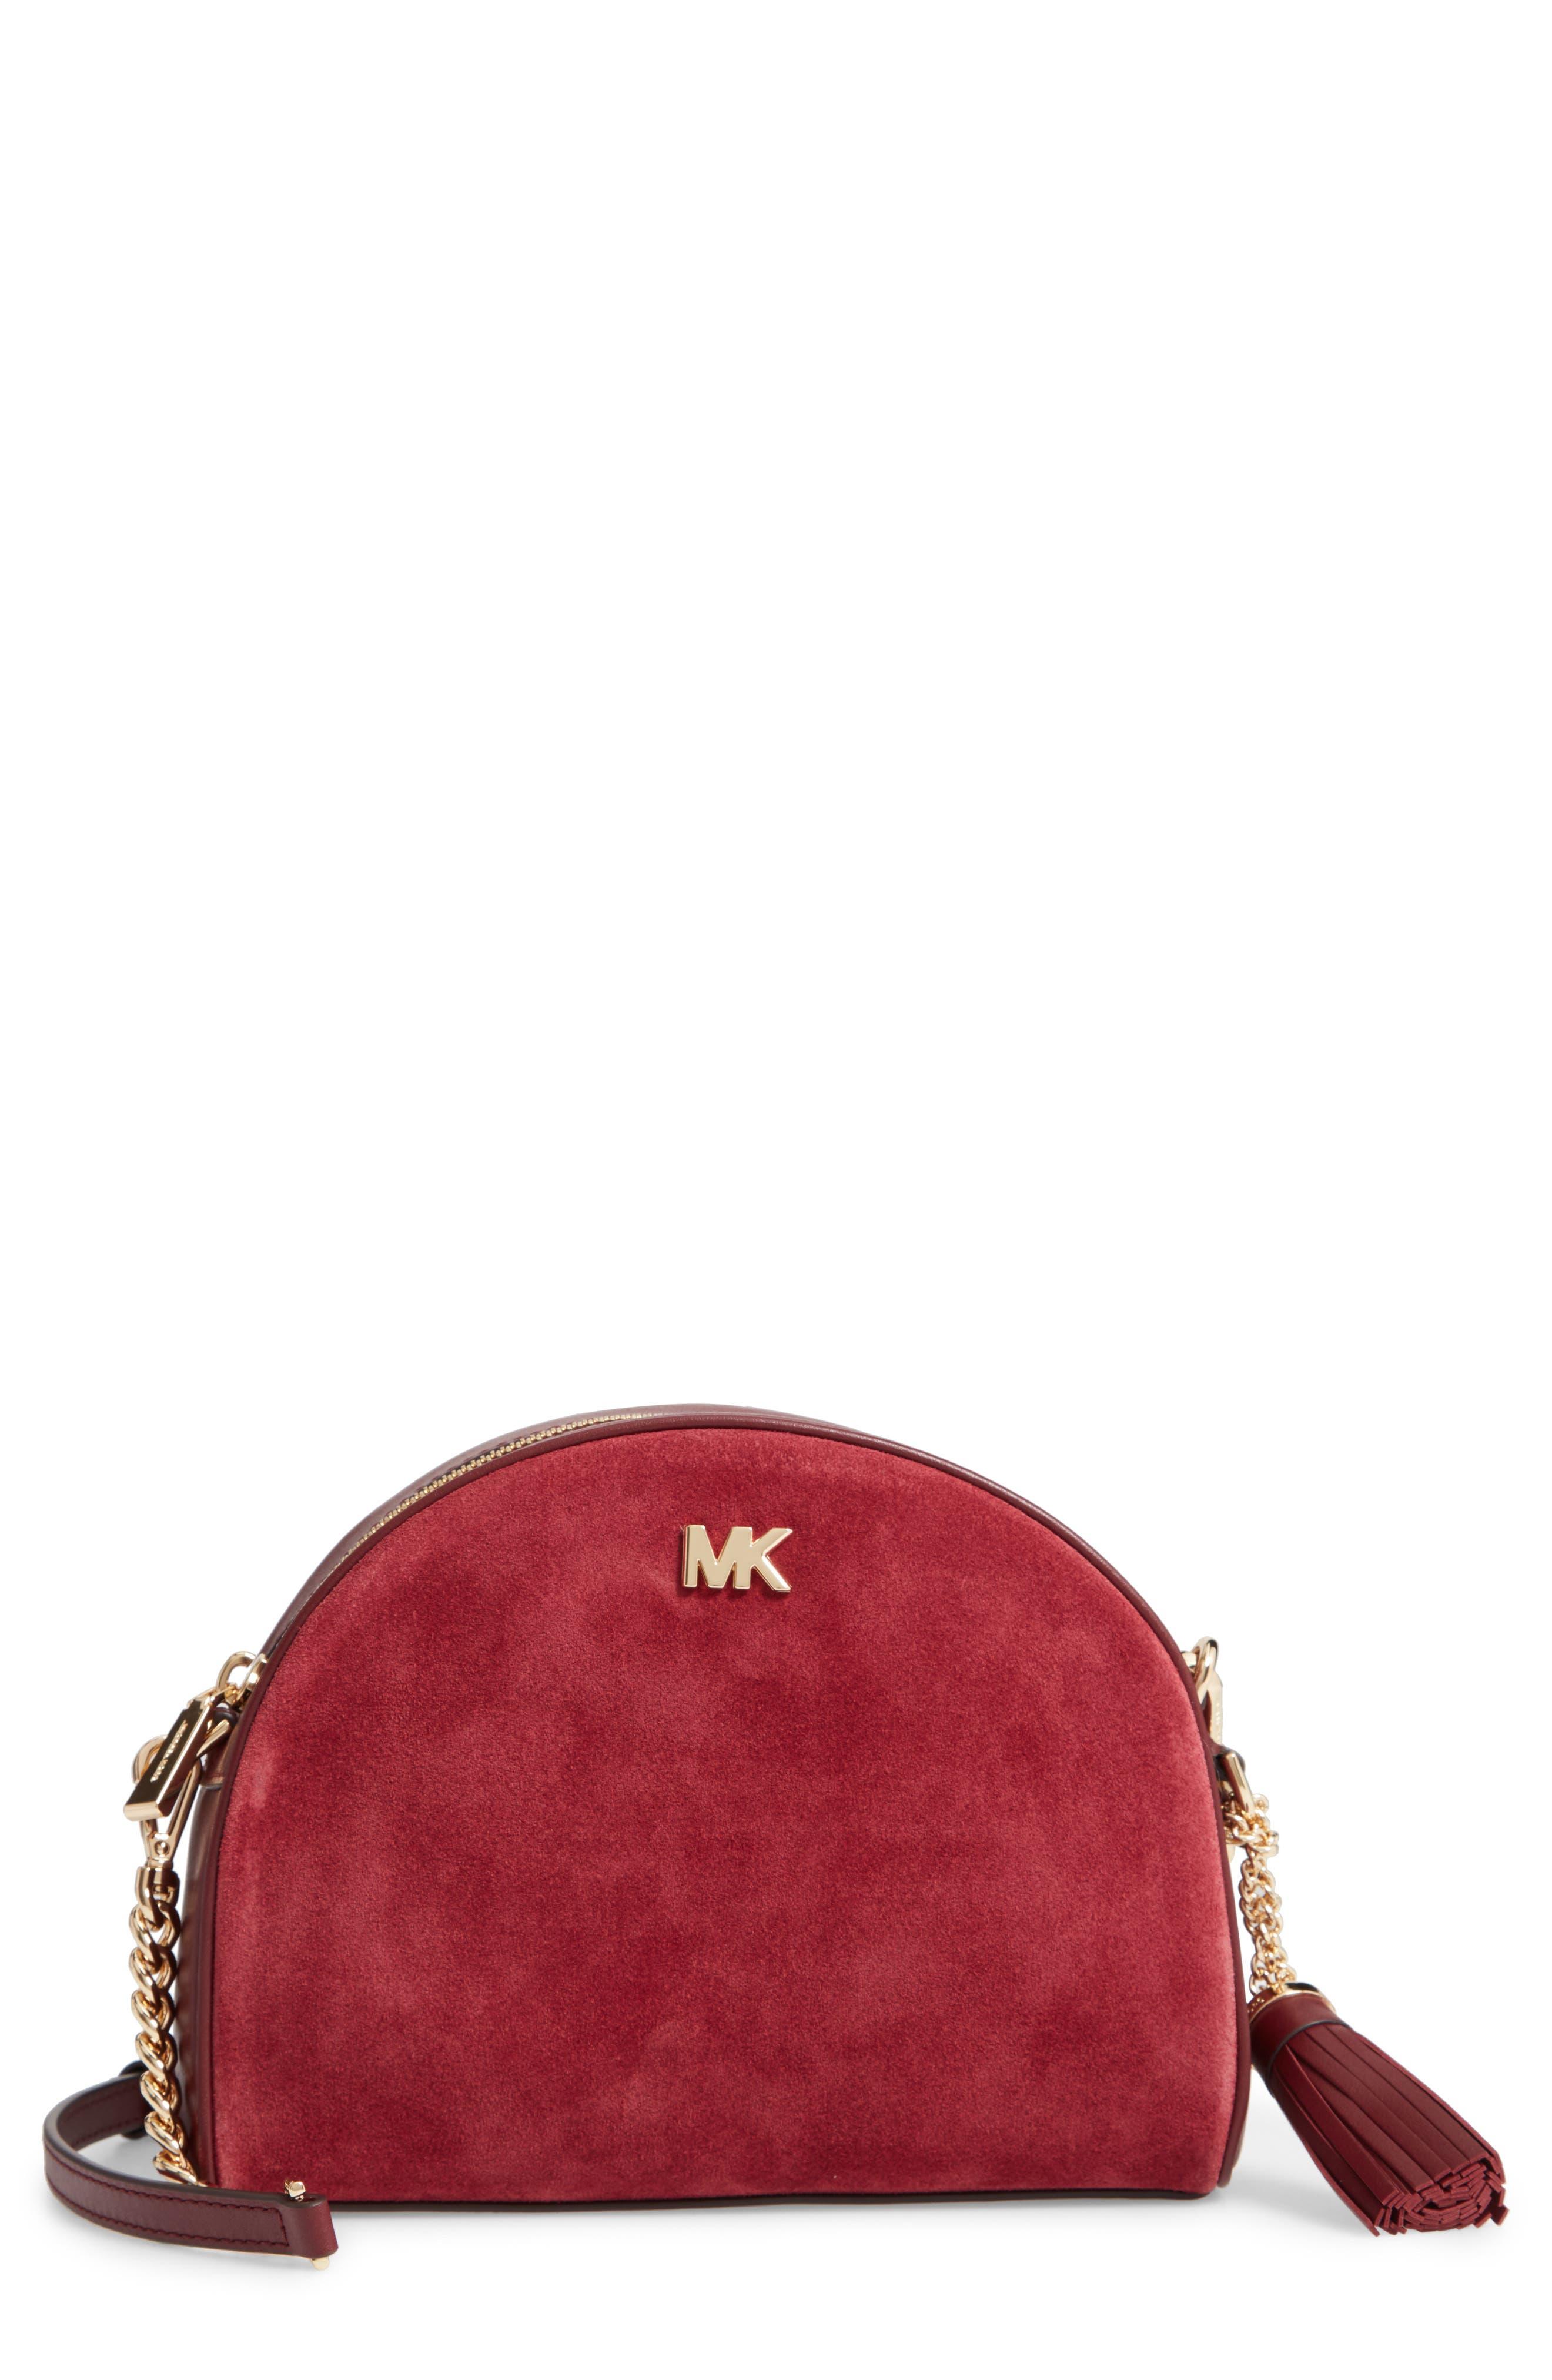 women s michael michael kors handbags wallets sale nordstrom rh shop nordstrom com michael kors wallet wristlet nordstrom michael kors handbags at nordstrom rack